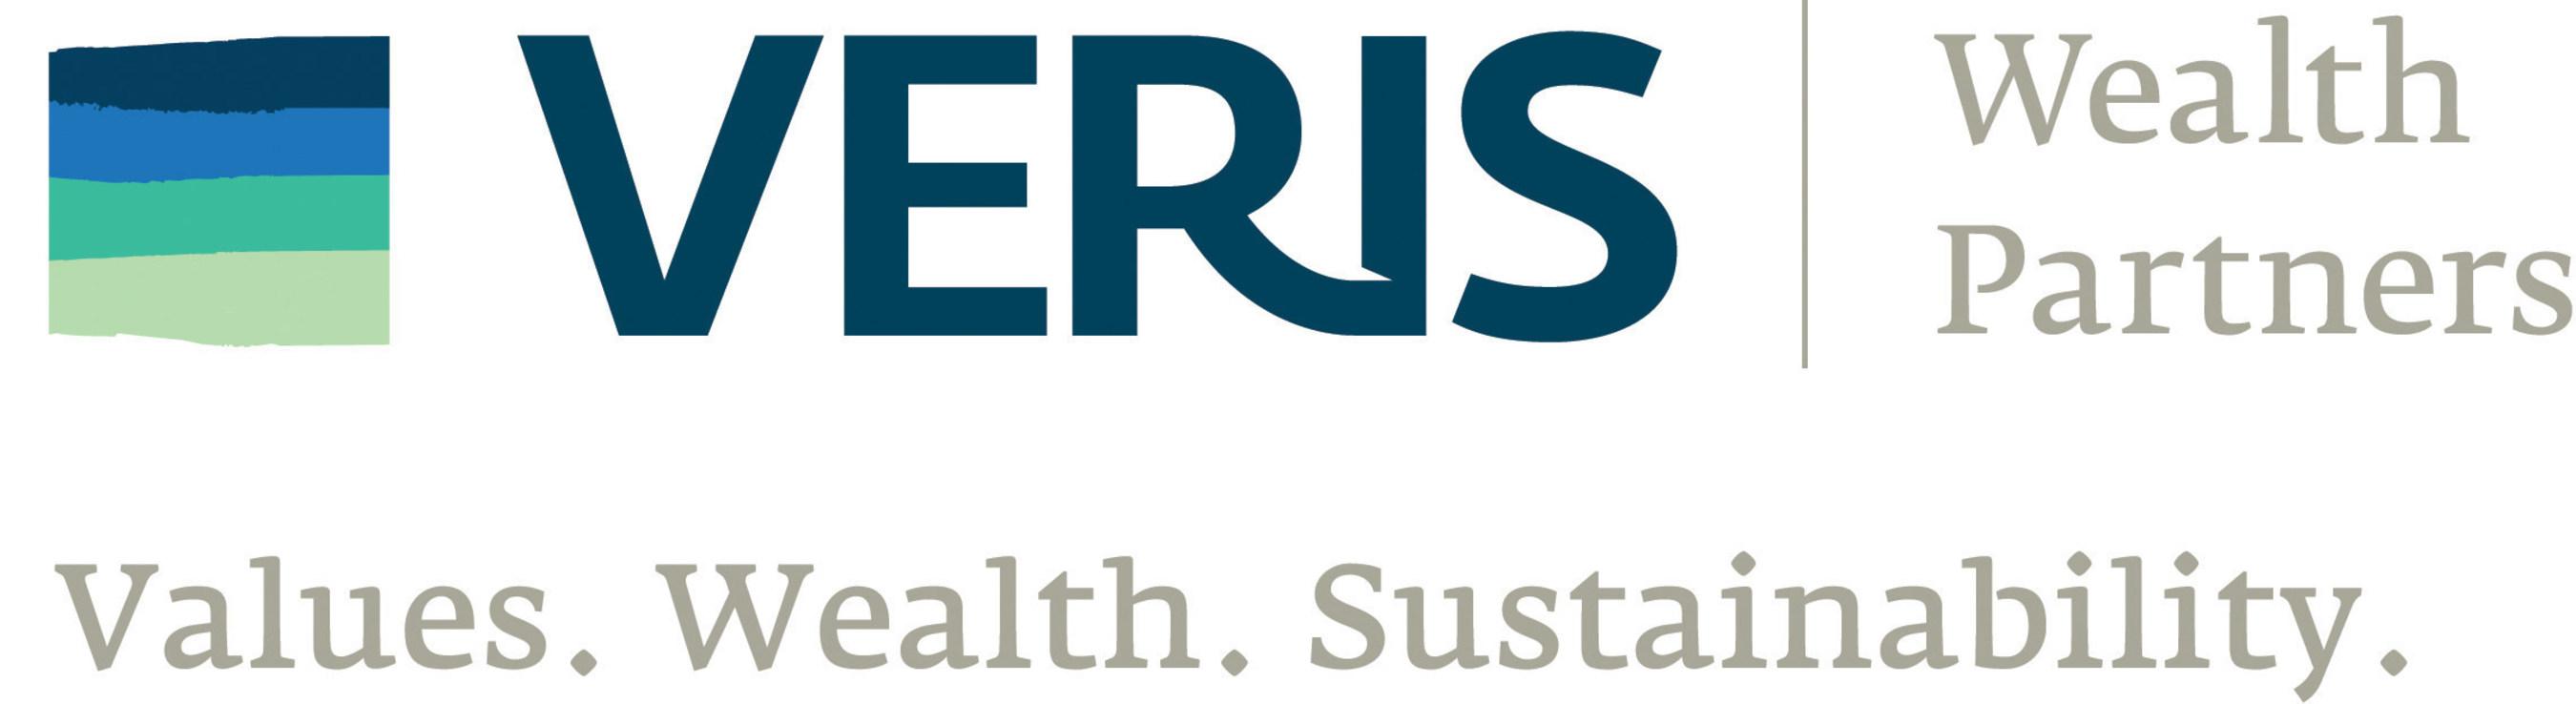 Veris Wealth Partners